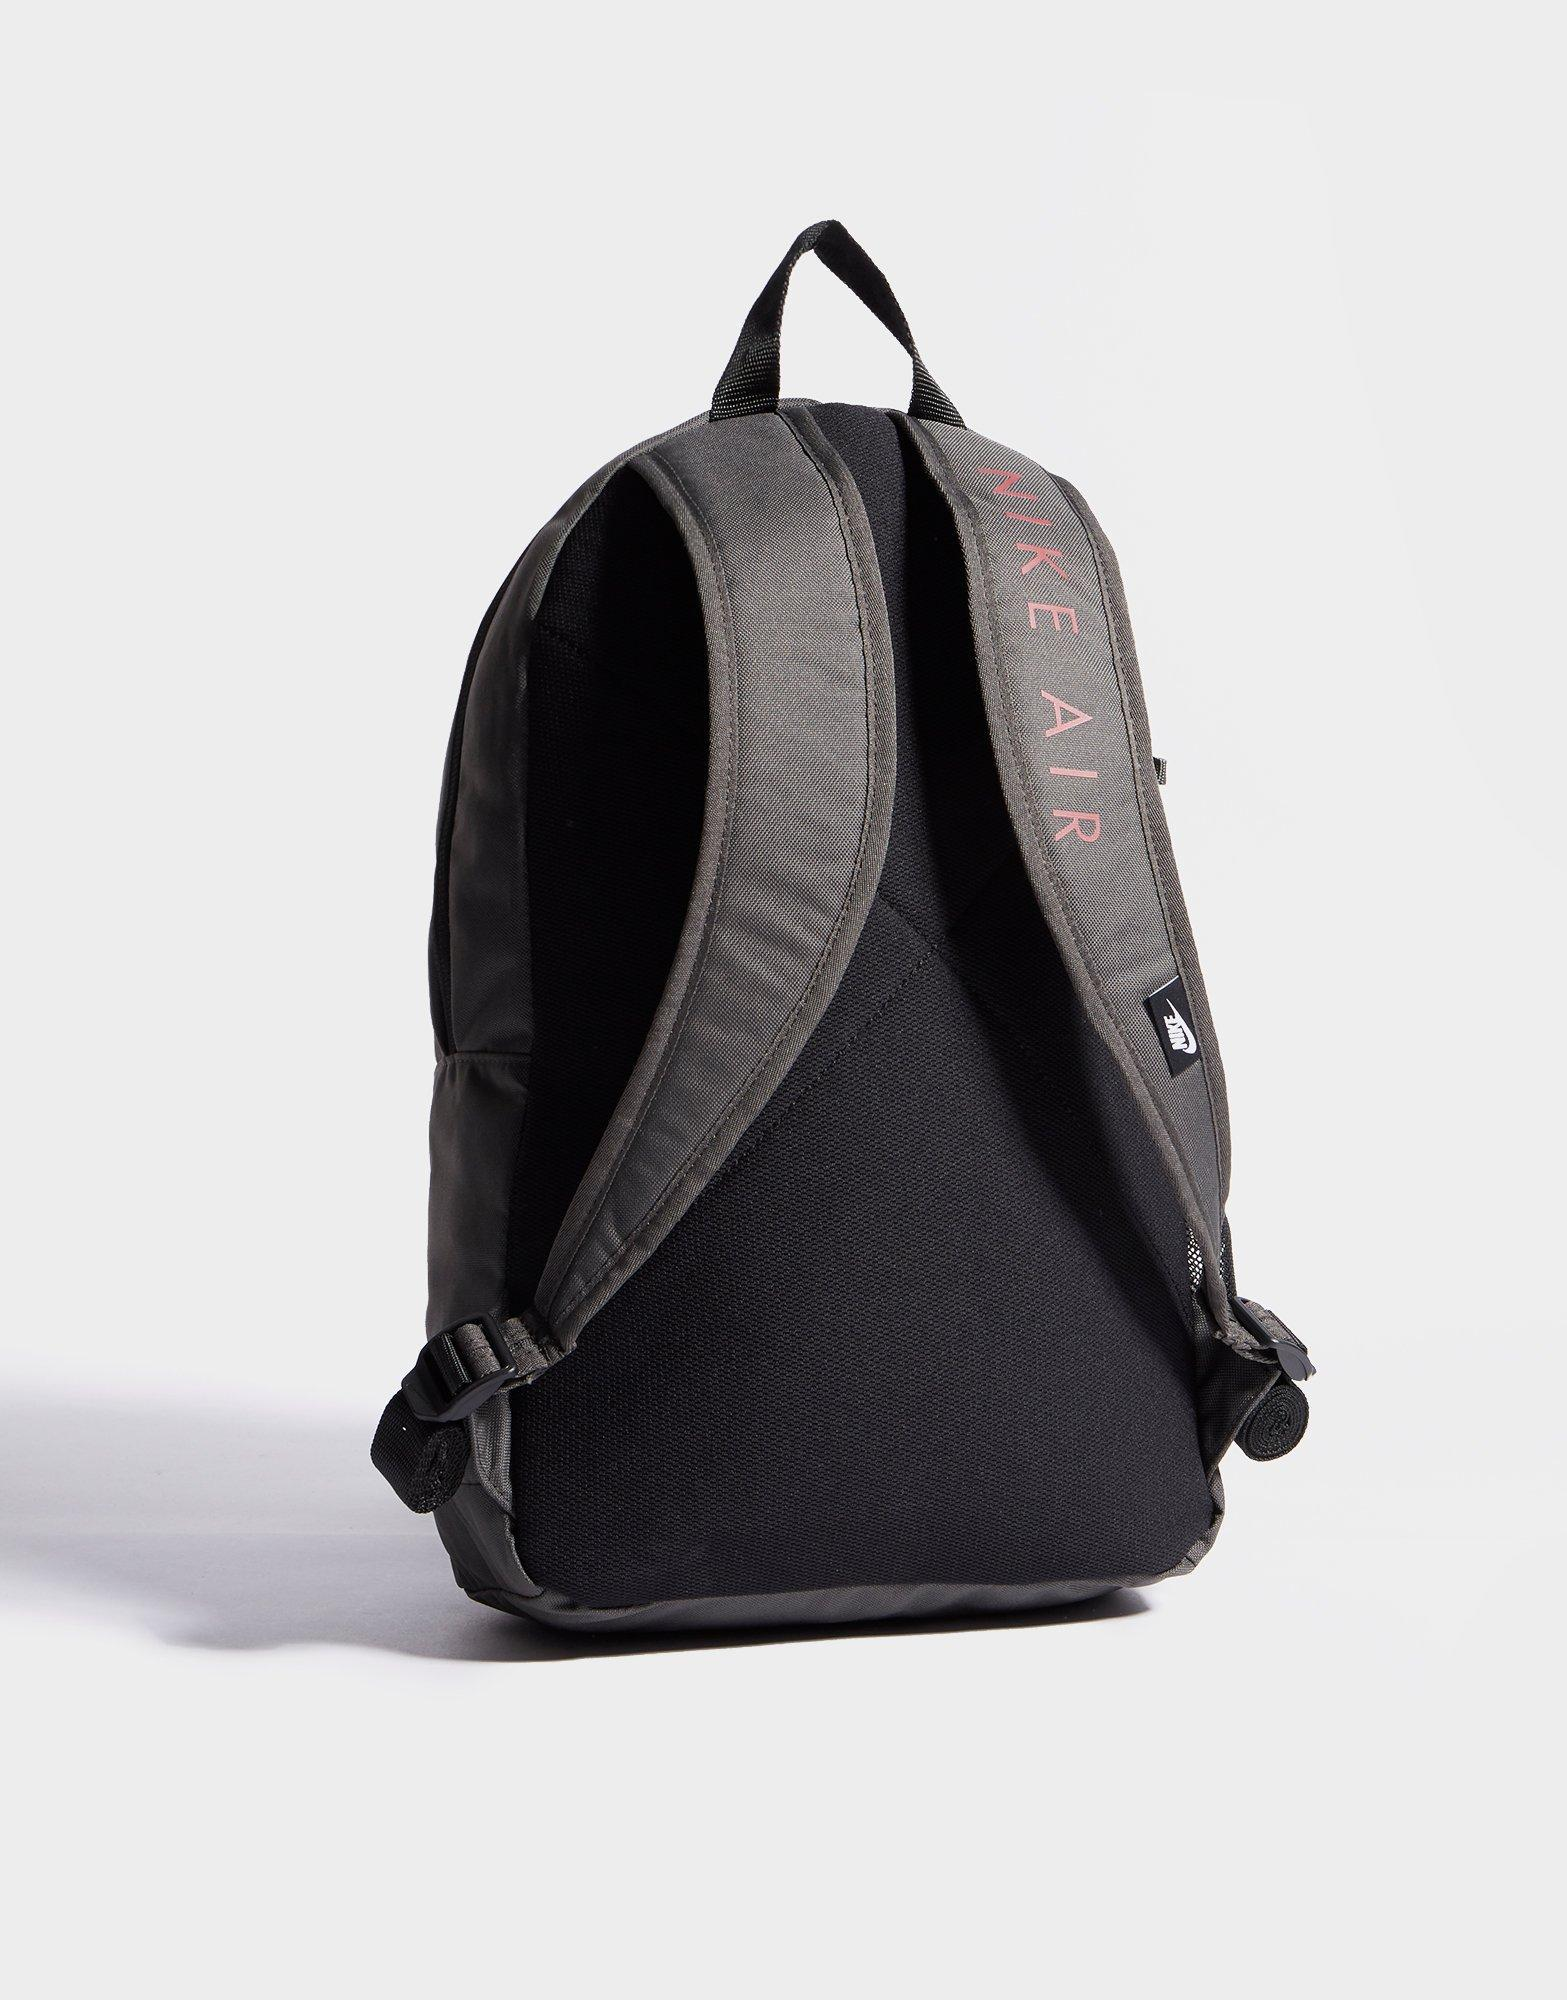 f606f44c46 Nike Elemental Backpack in Gray for Men - Lyst